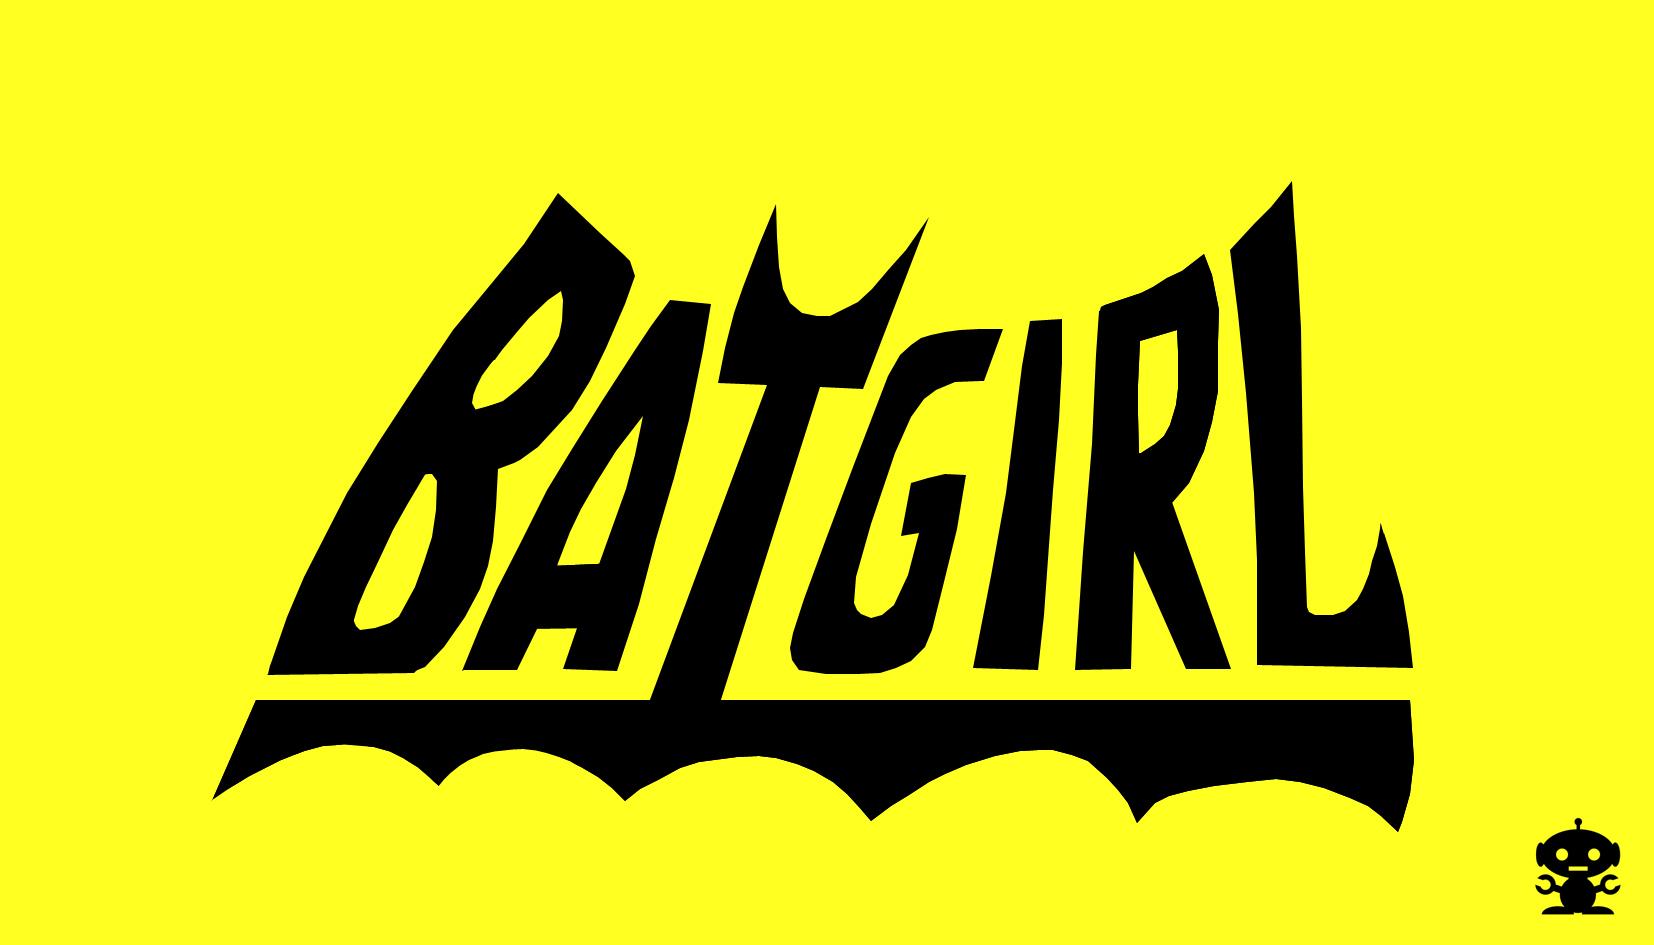 1967 batgirl on batman tv show title logo by thedorkknightreturns thedorkknightreturns 1967 batgirl on batman tv show title logo by thedorkknightreturns buycottarizona